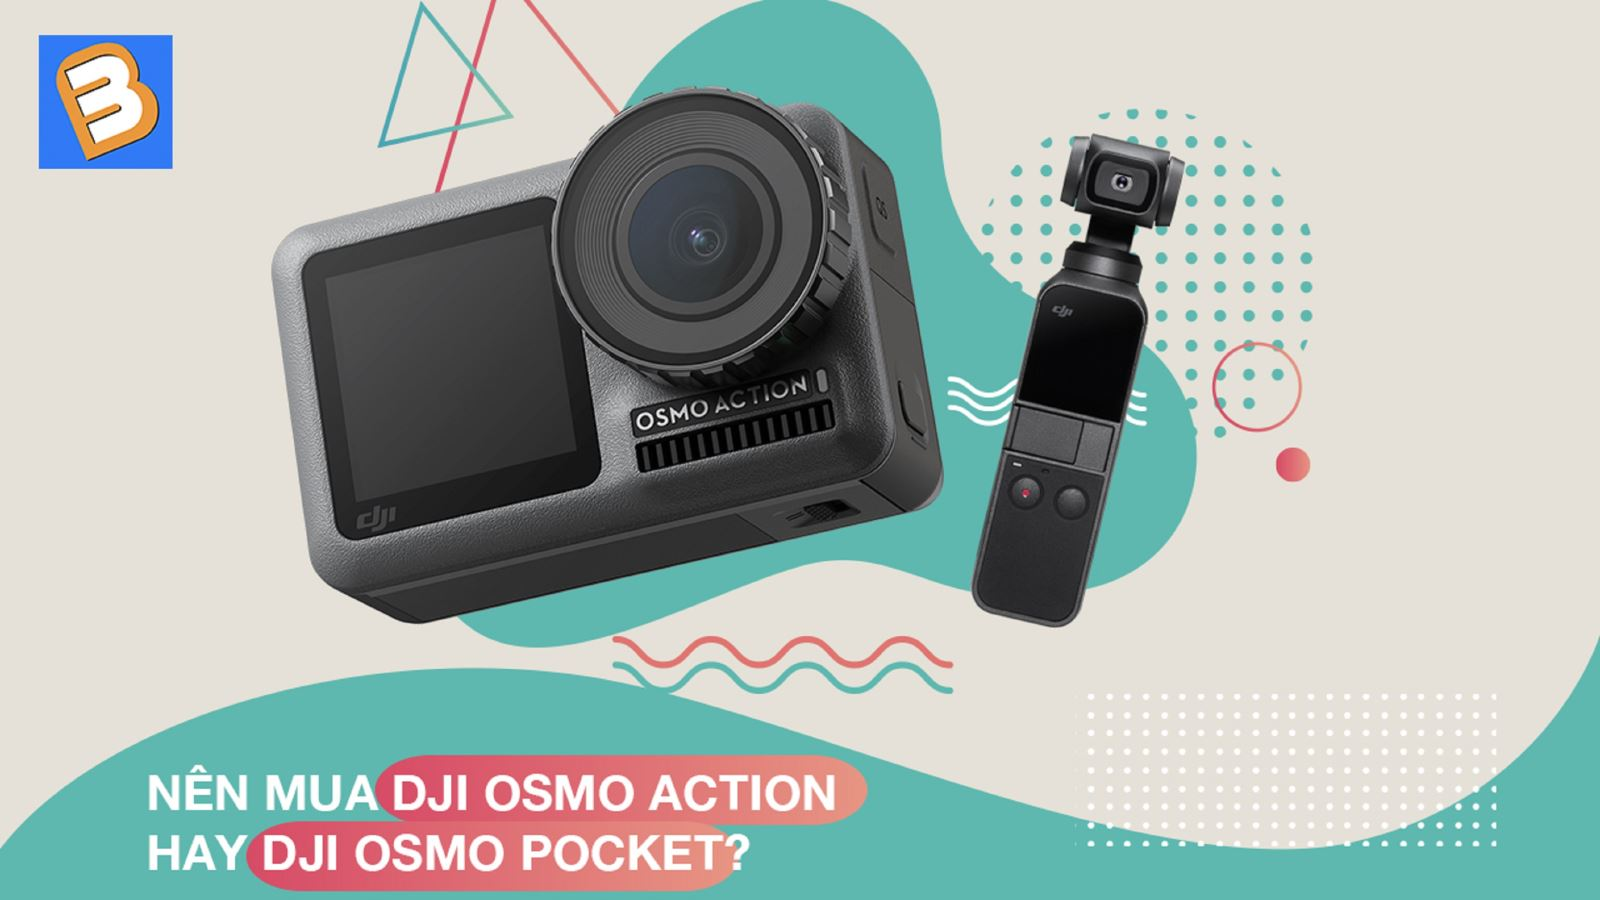 Nên muaDJI Osmo Action hay DJI Osmo Pocket?